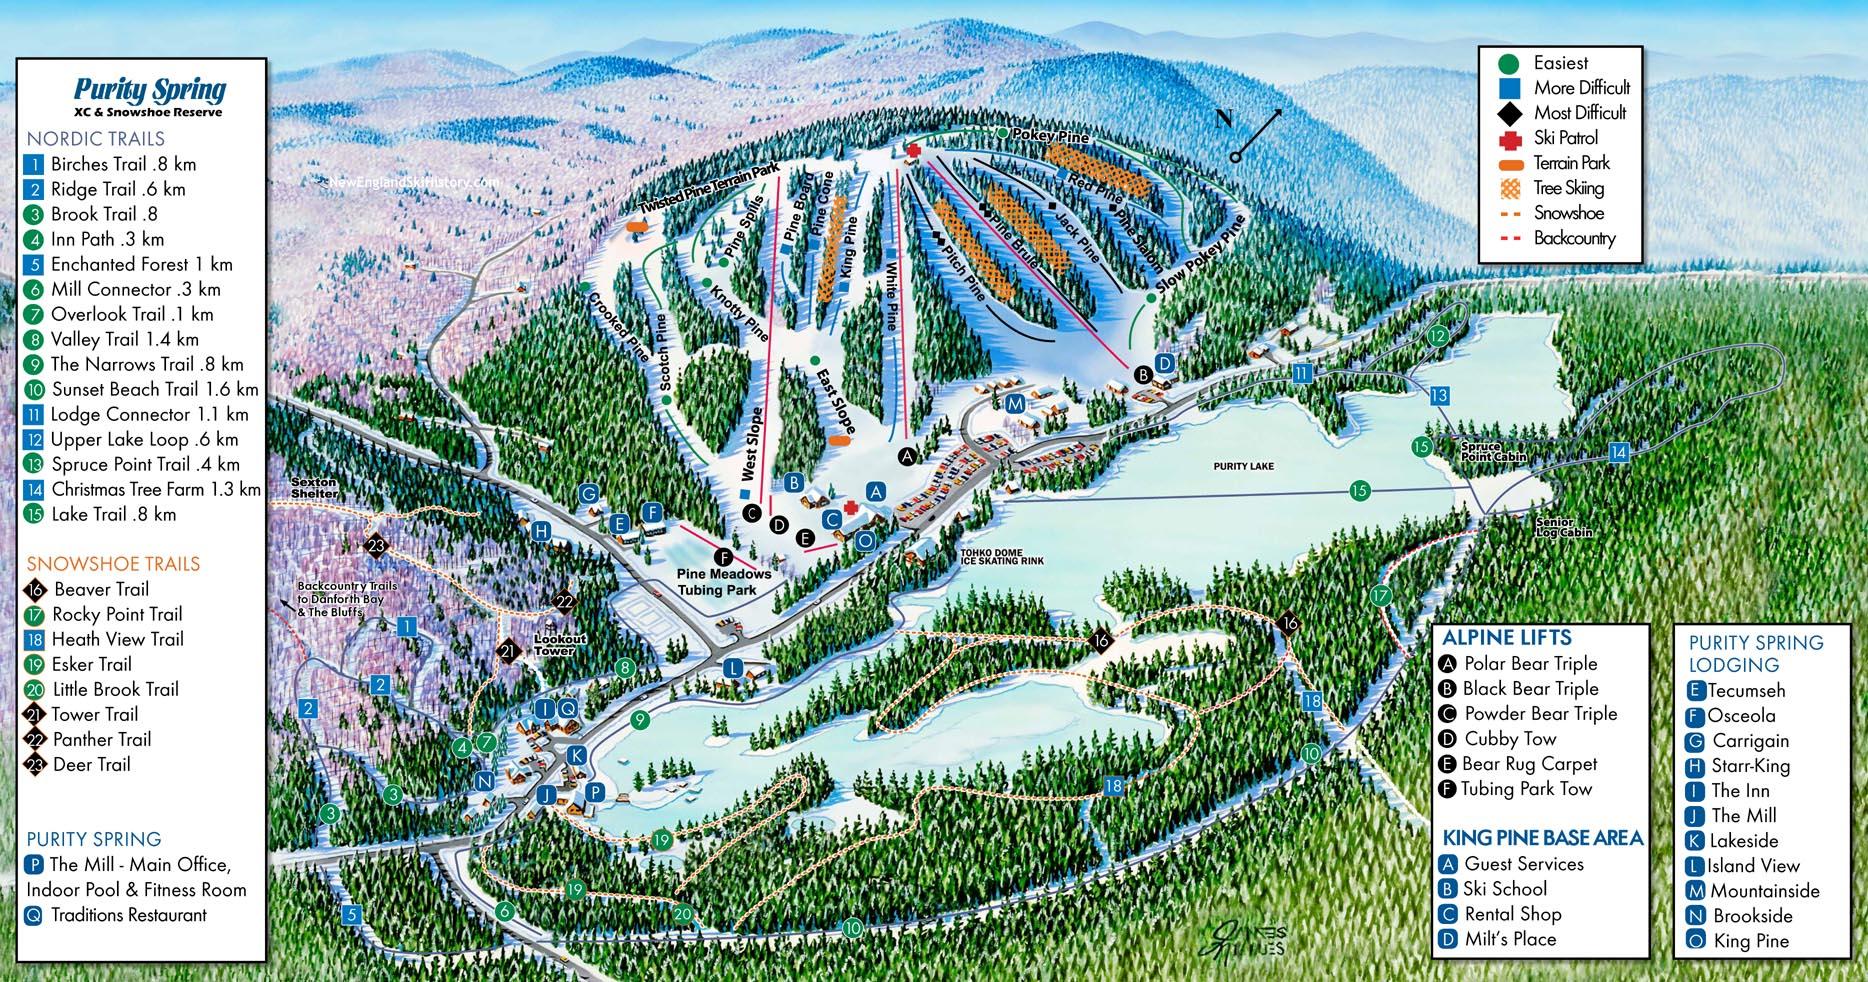 2020-21 King Pine Trail Map